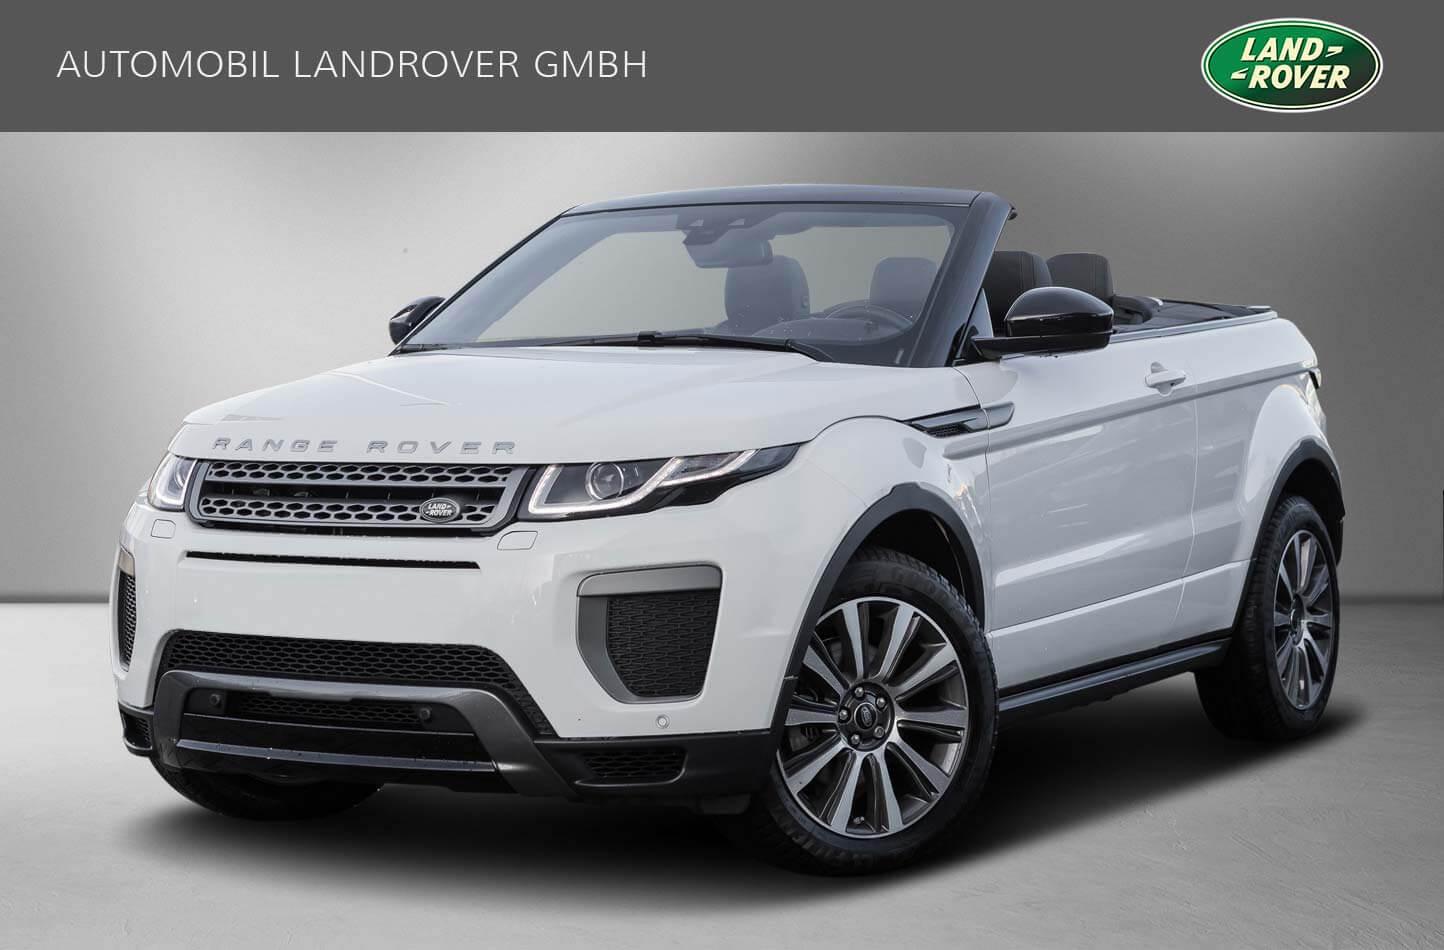 Range Rover Bild bearbeitet